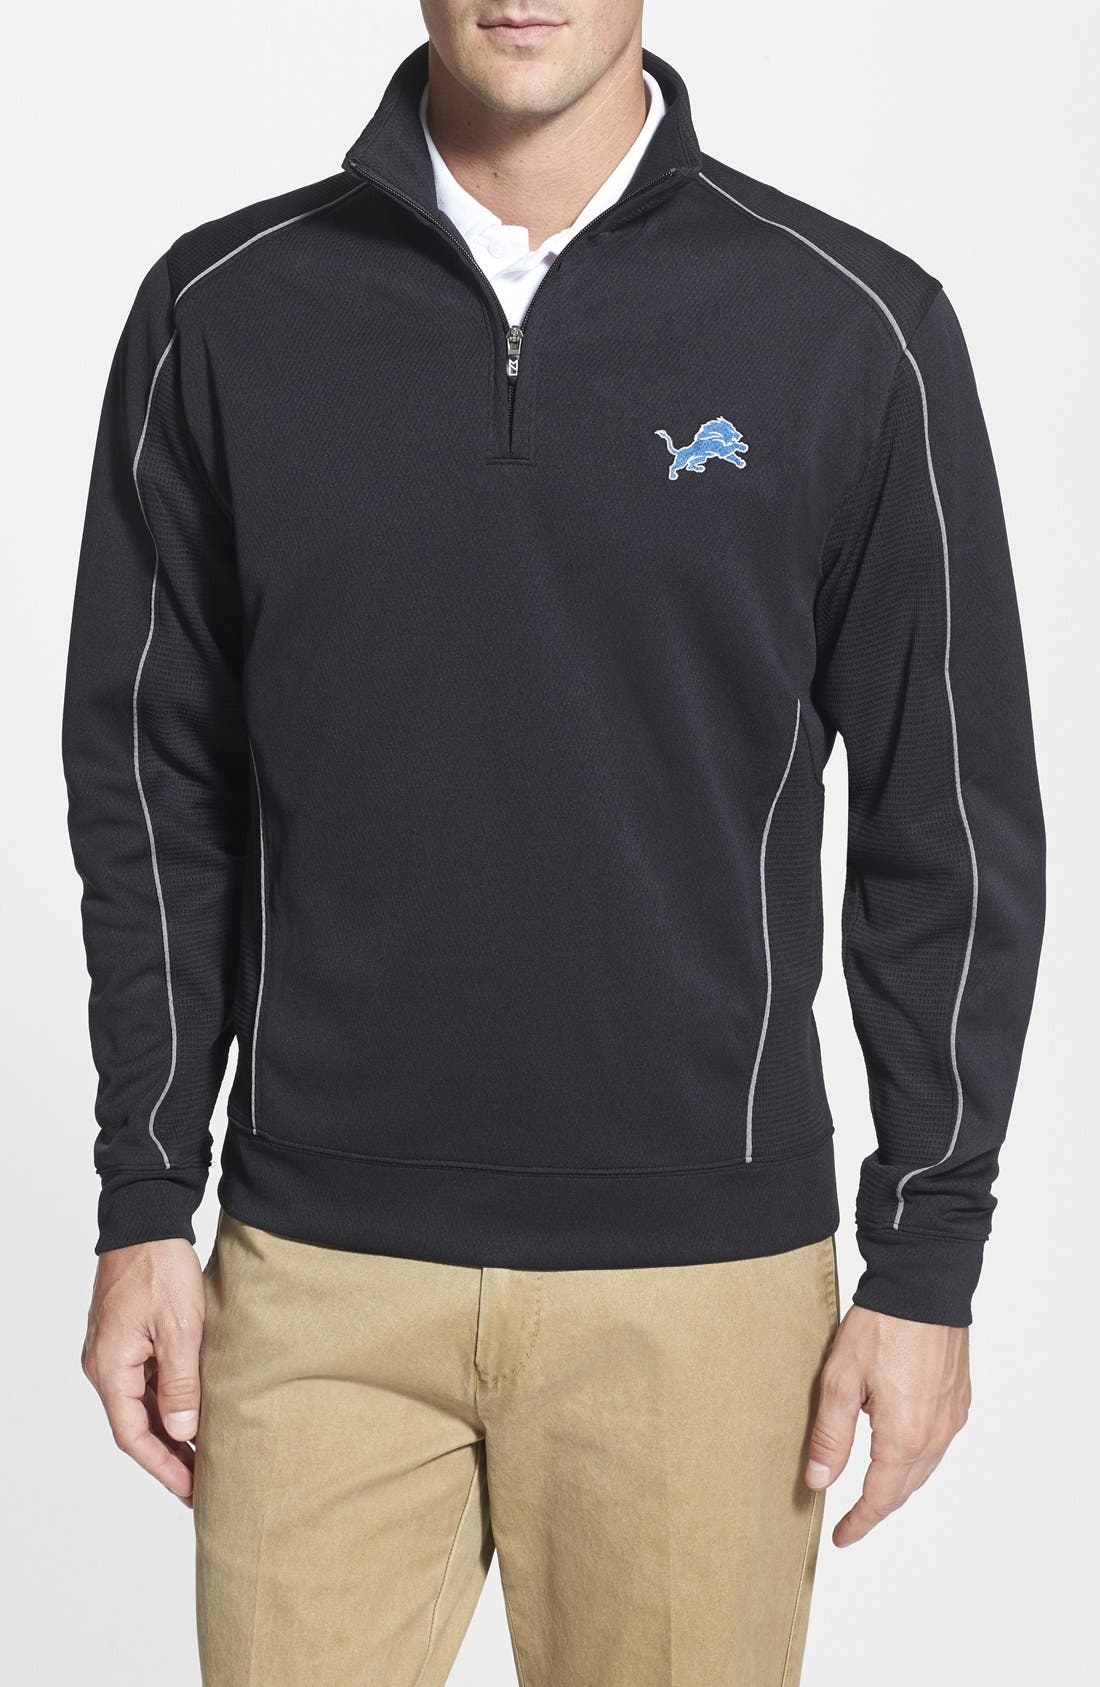 Detroit Lions - Edge DryTec Moisture Wicking Half Zip Pullover,                             Main thumbnail 1, color,                             Black